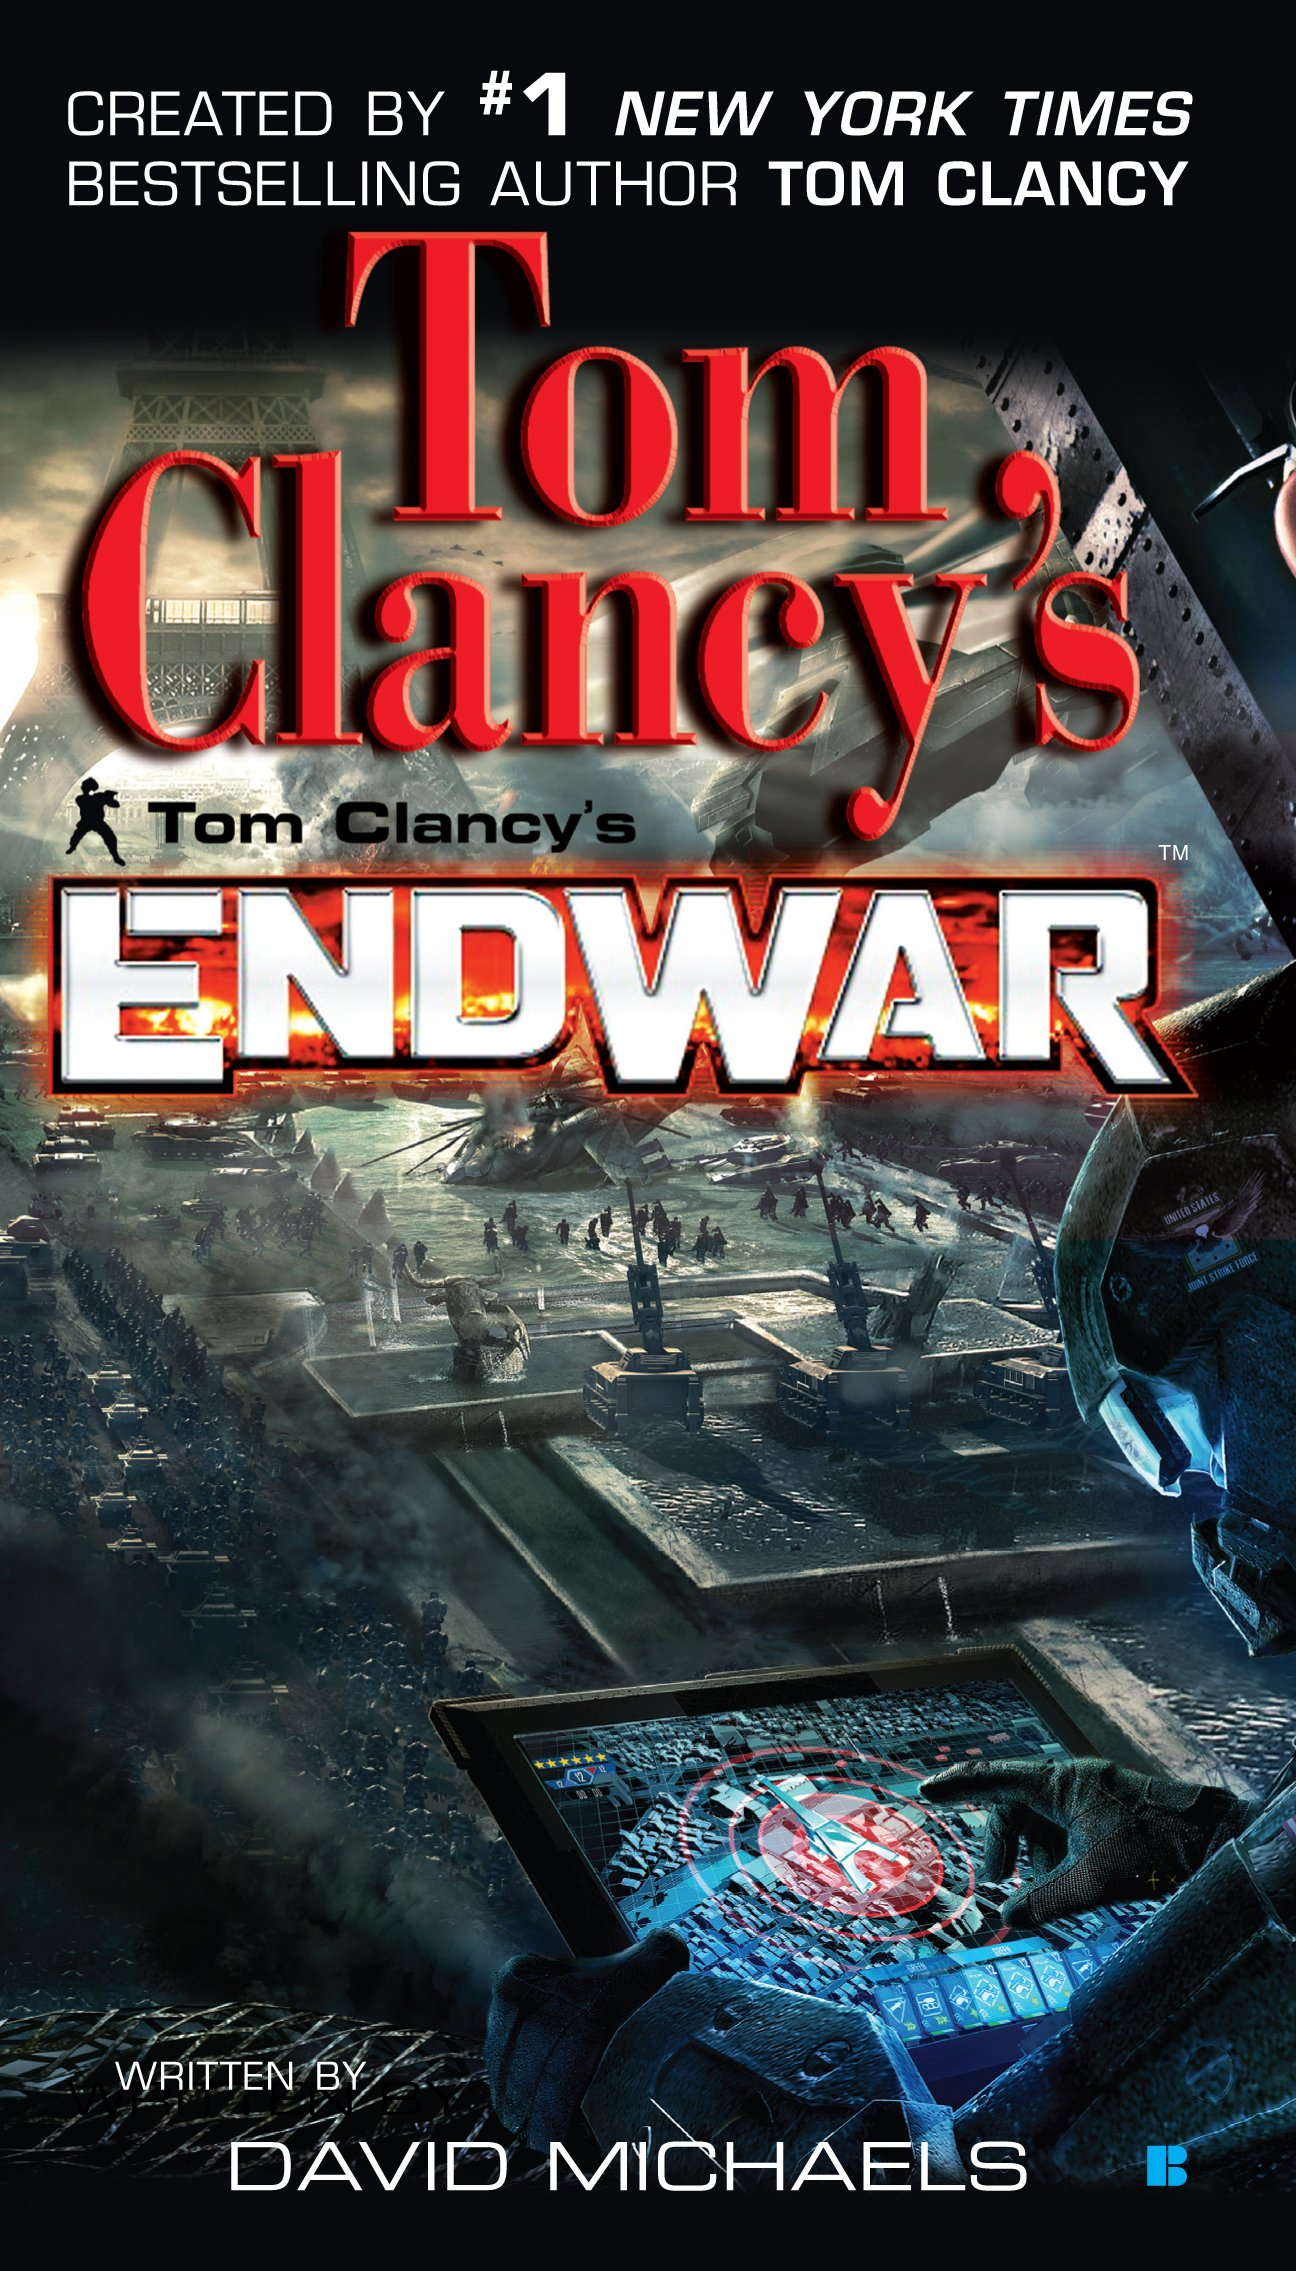 Tom Clancy Ssn Ebook